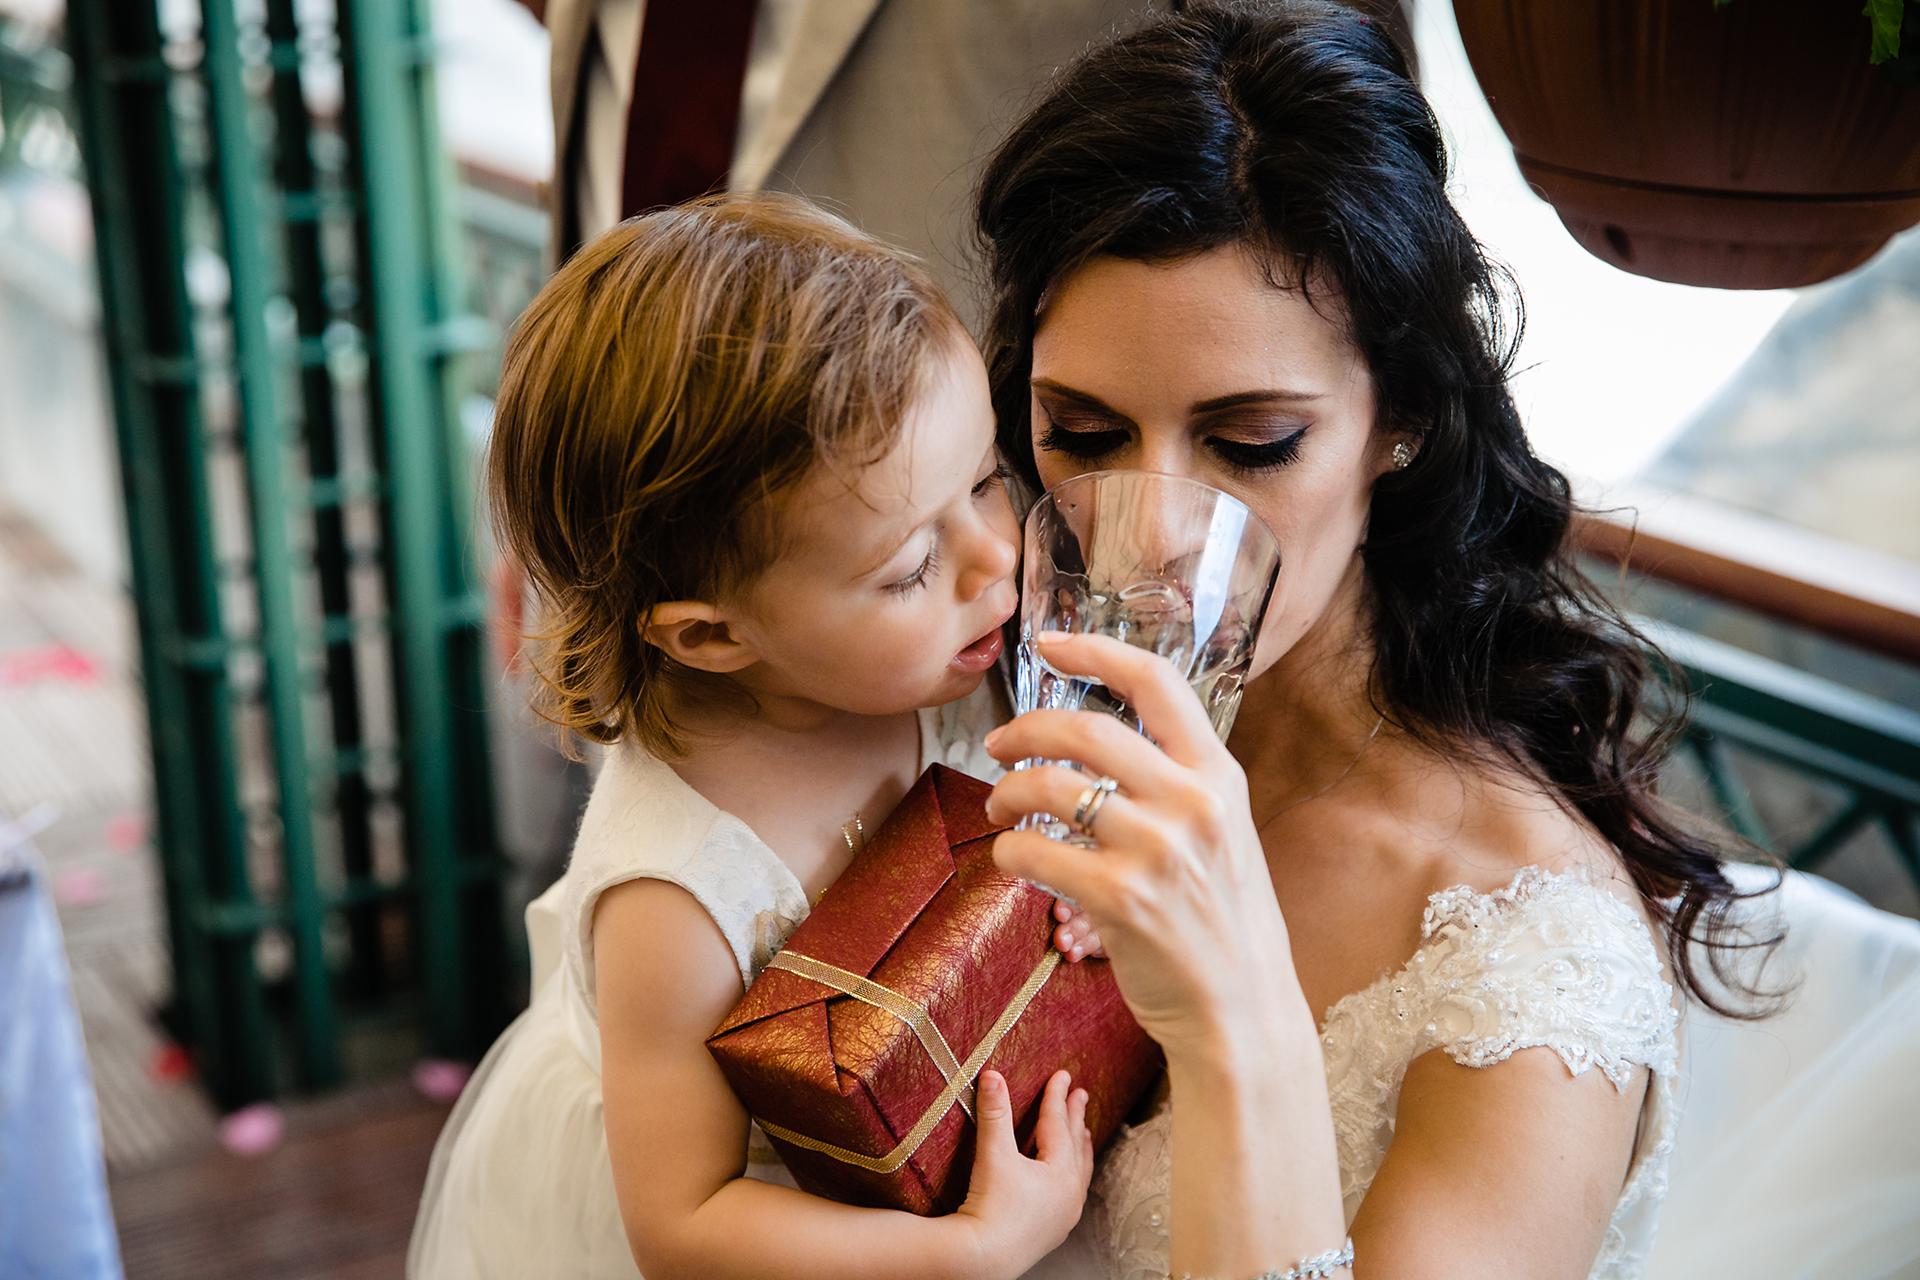 Tsvetelina Deliyska, of Sofia, is a wedding photographer for Grand Hotel Sofia